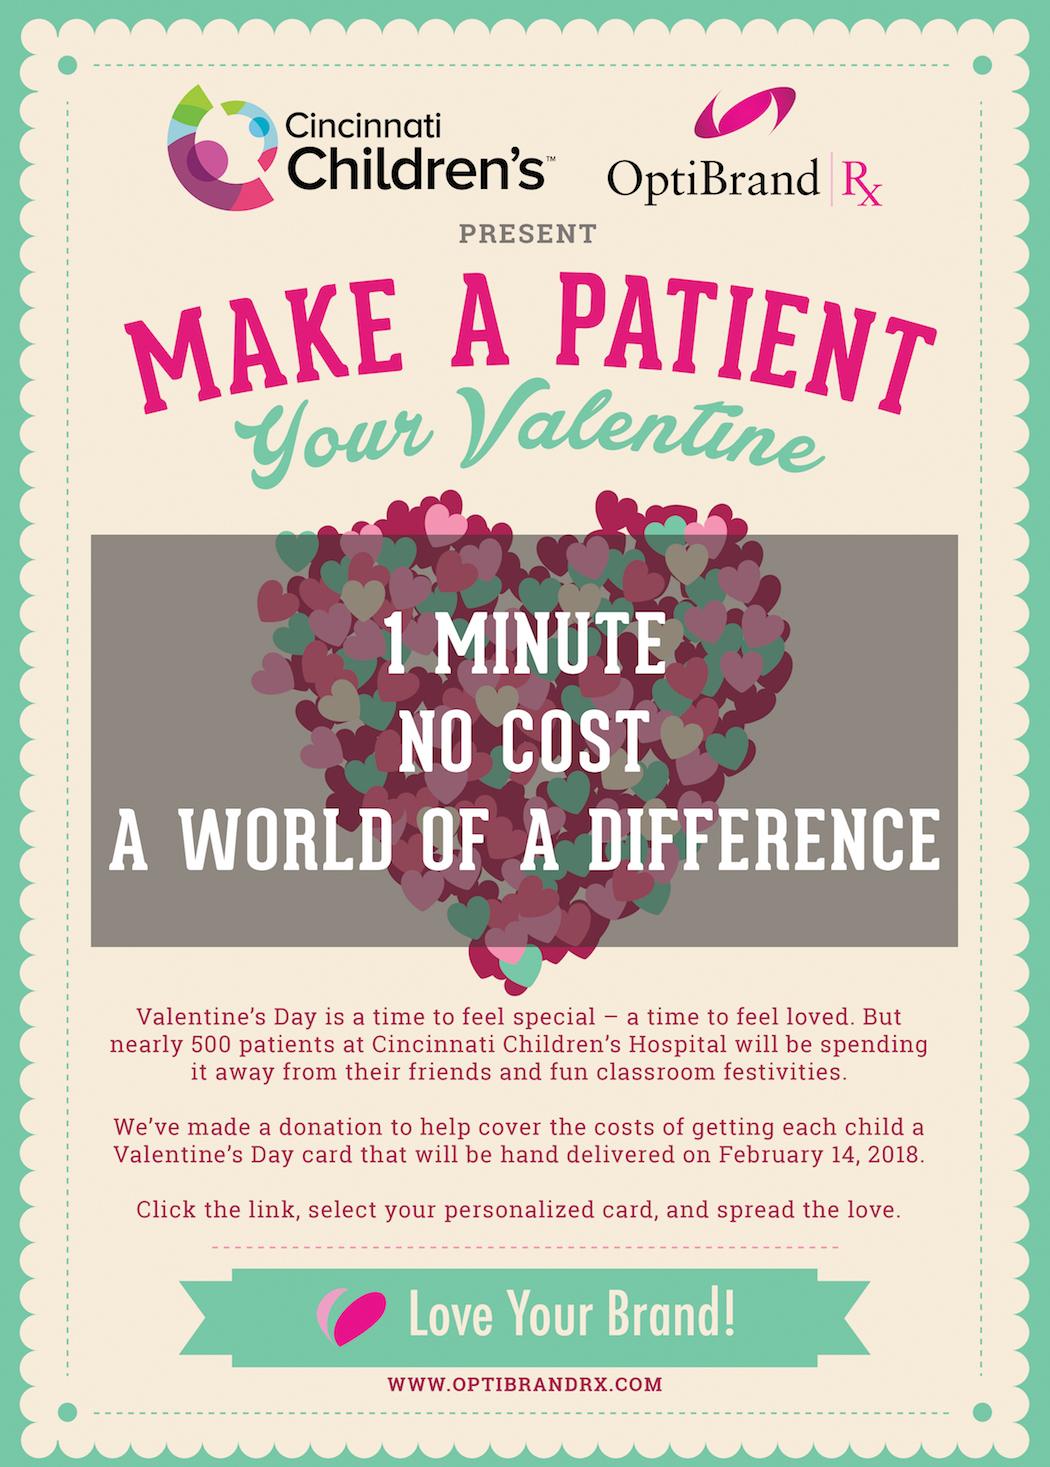 OptiBrand_Rx_Make_a_Patient_Your_Valentine_RGB.jpg